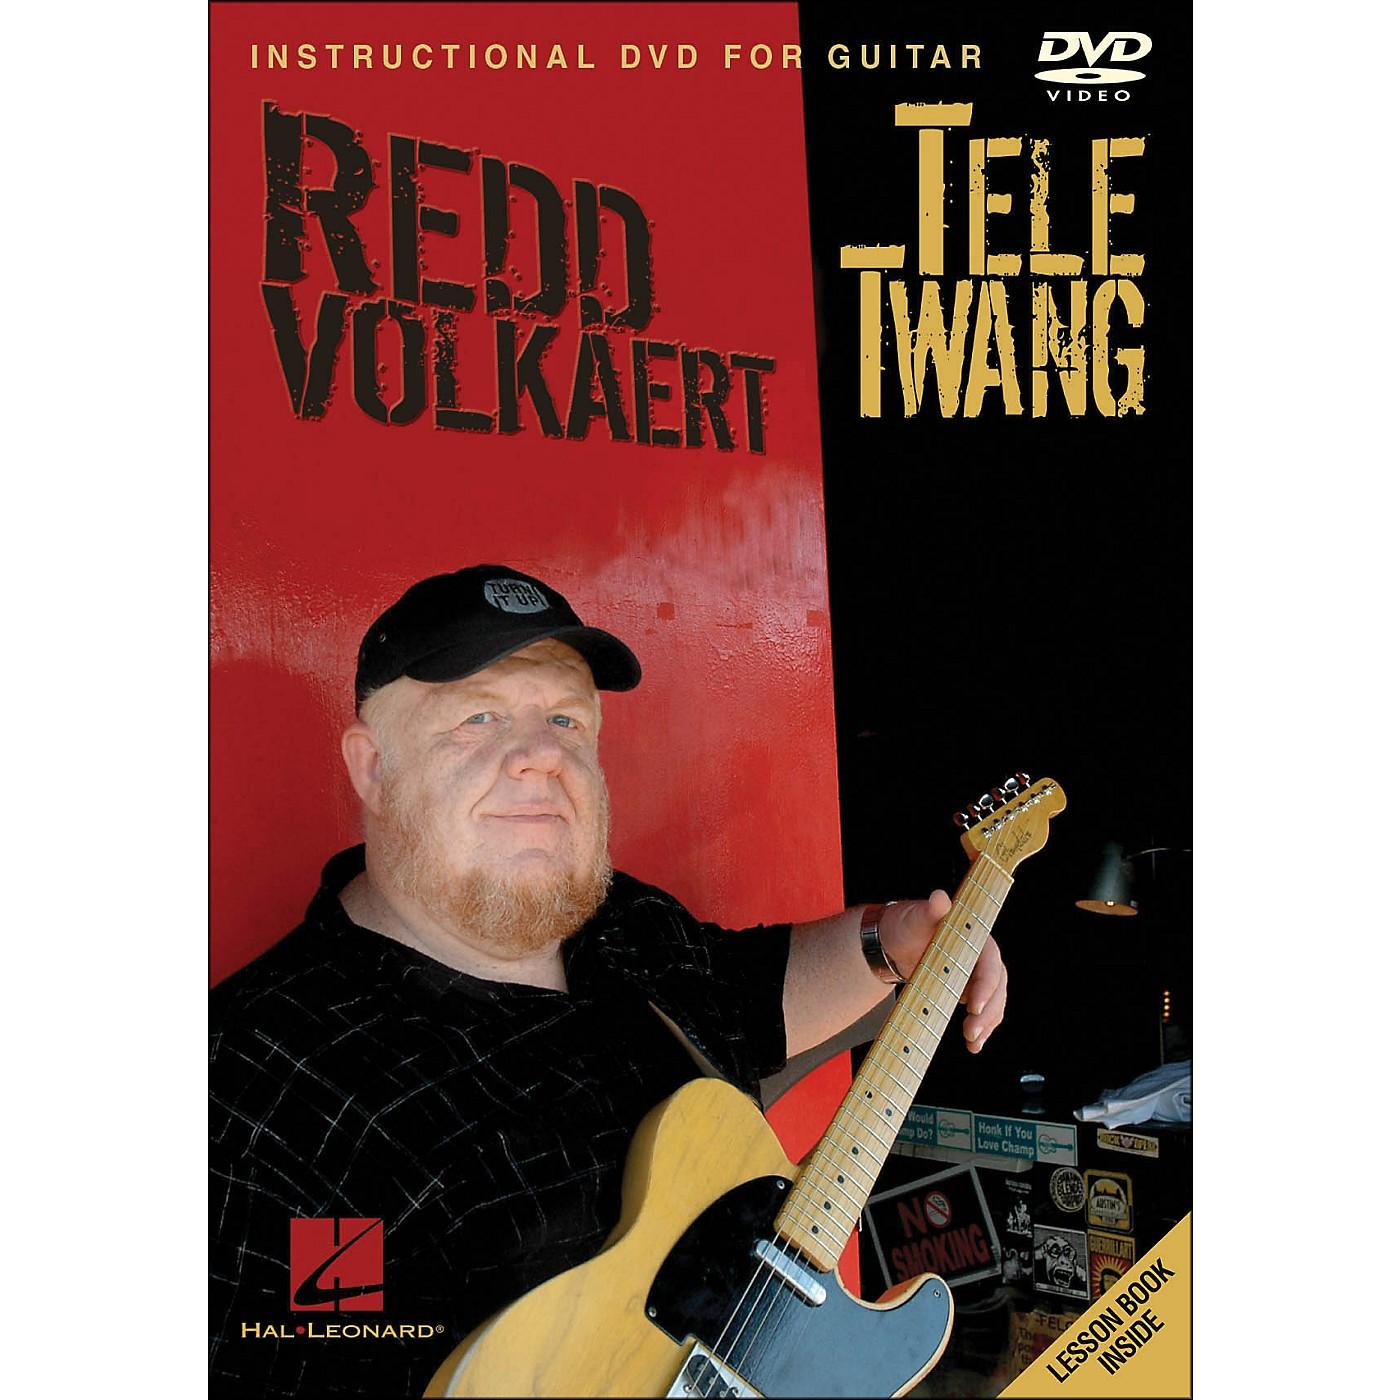 Hal Leonard Redd Volkaert Tele Twang - Instructional & Performance Guitar DVD thumbnail